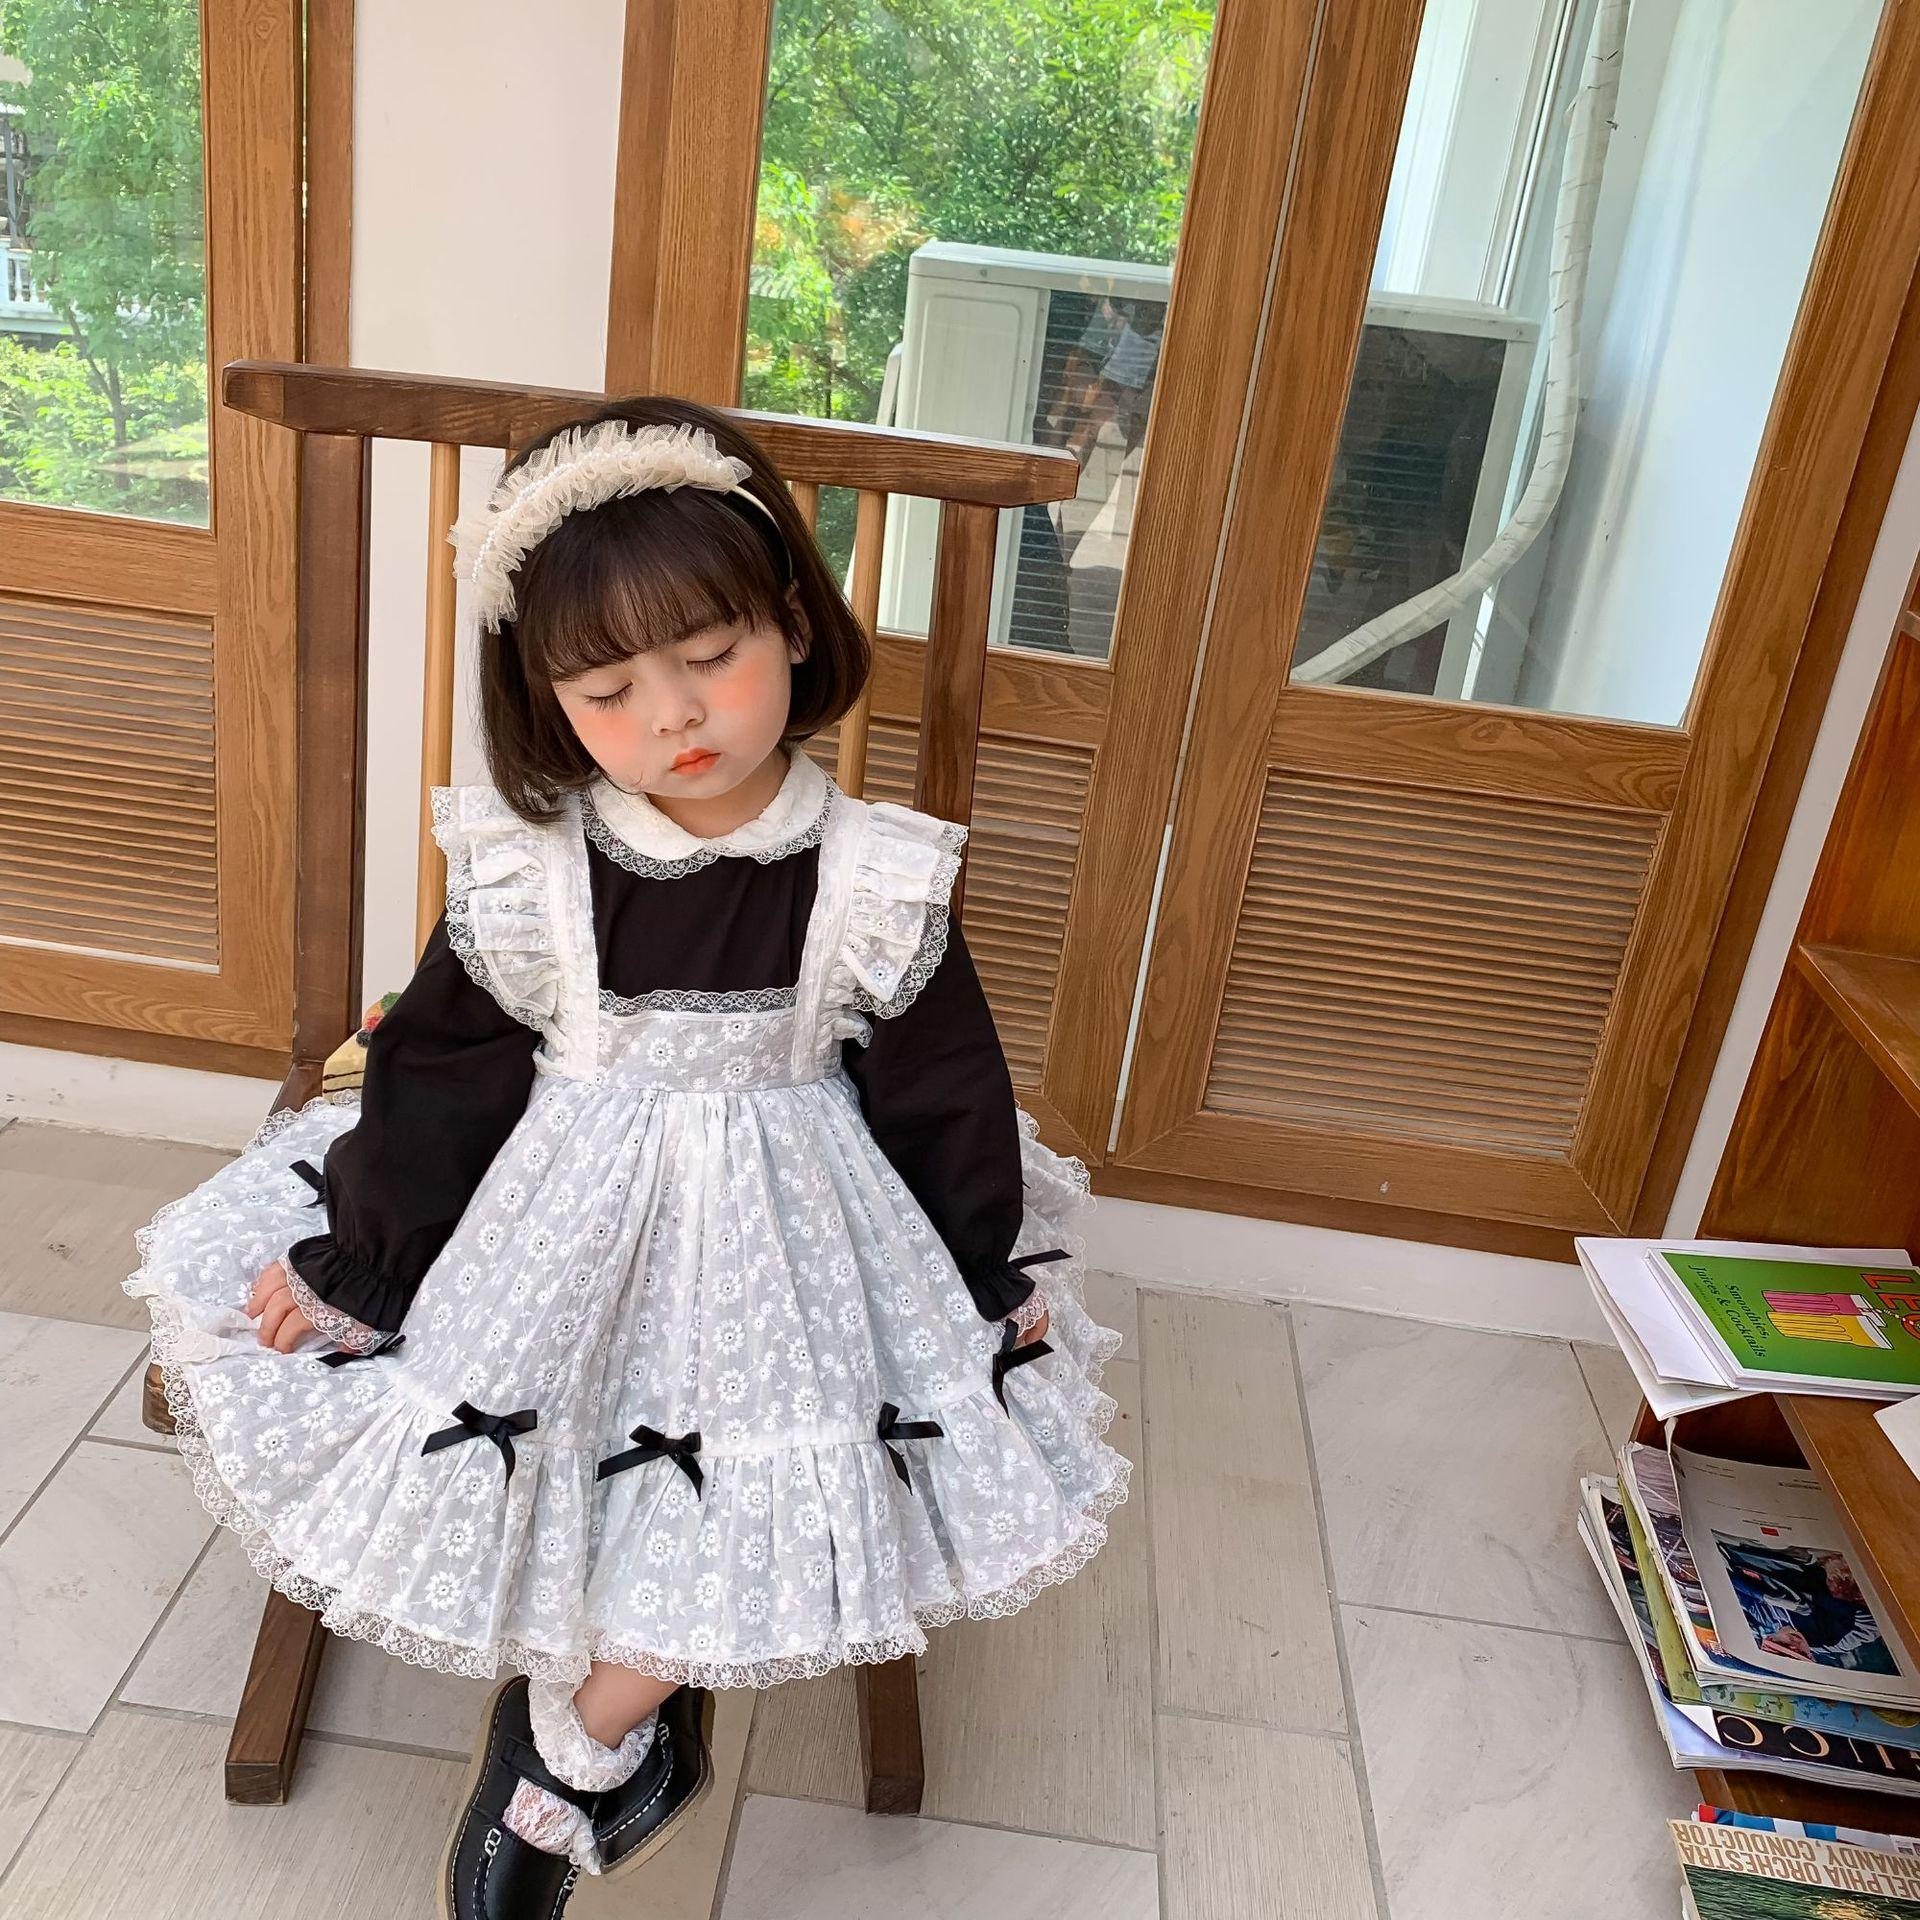 Palace style Baby girls maid dress 2020 fall new children lace laepl long sleeve pleated dress kids lace falbala fly sleeve bib dress A3688